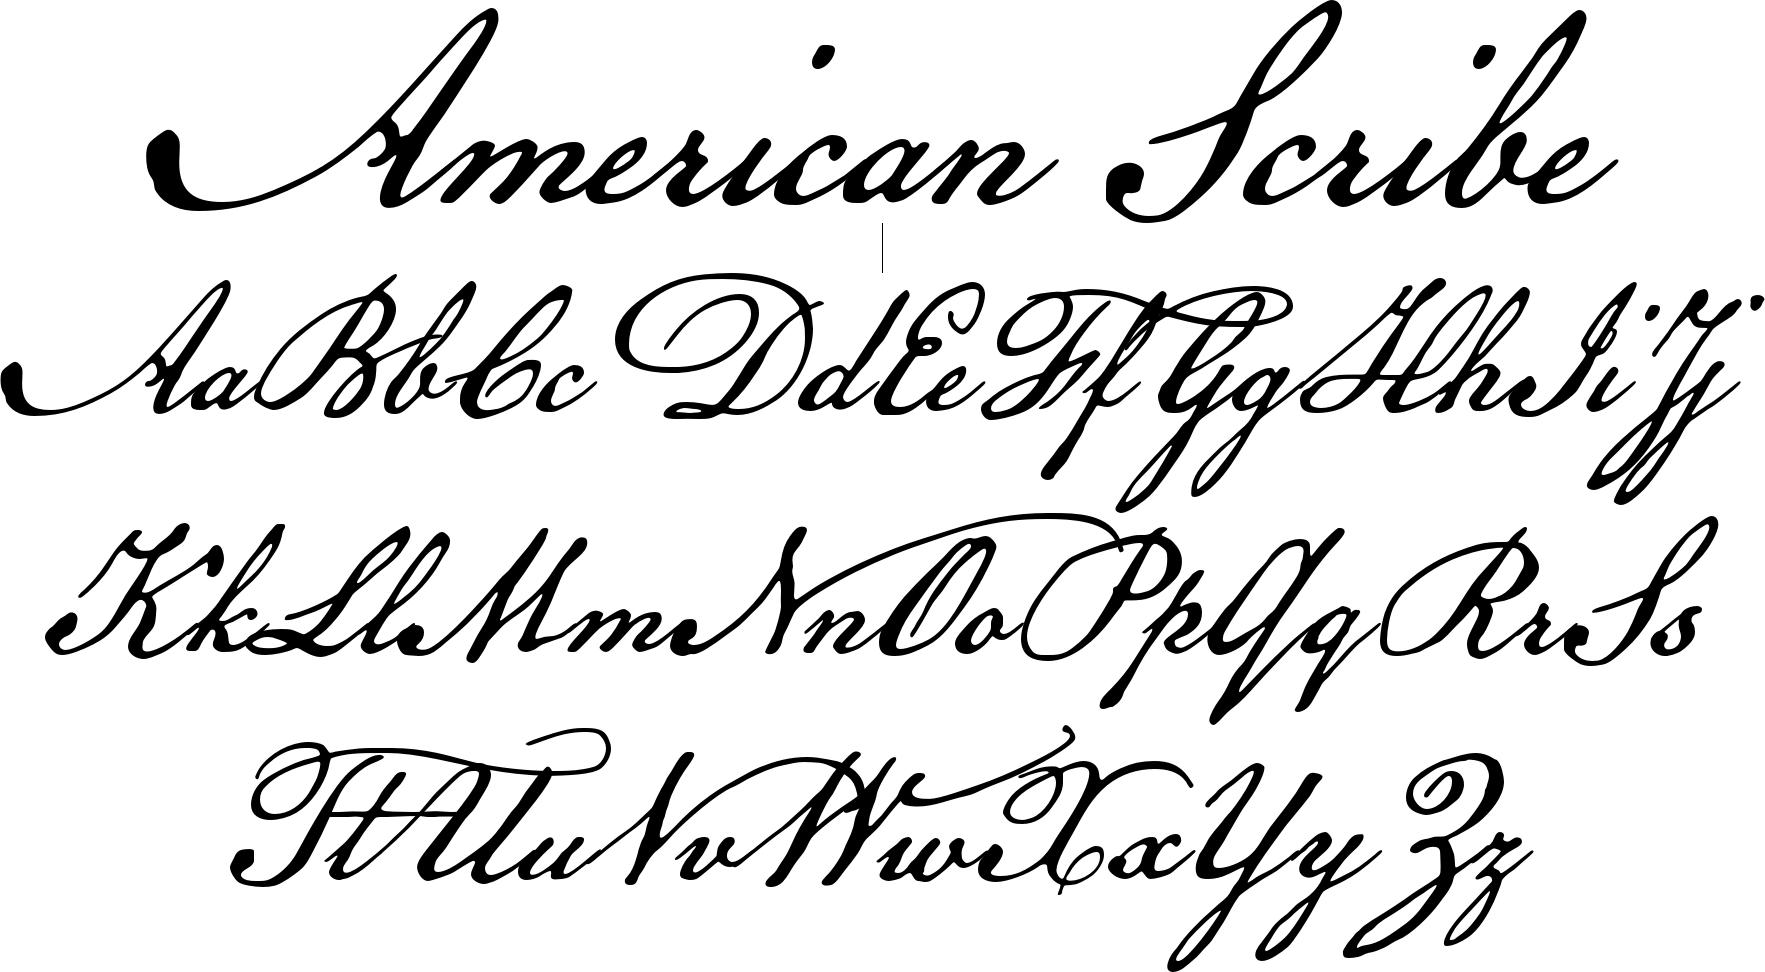 OldFonts.com | Our Famous Historical Pen Fonts Collection